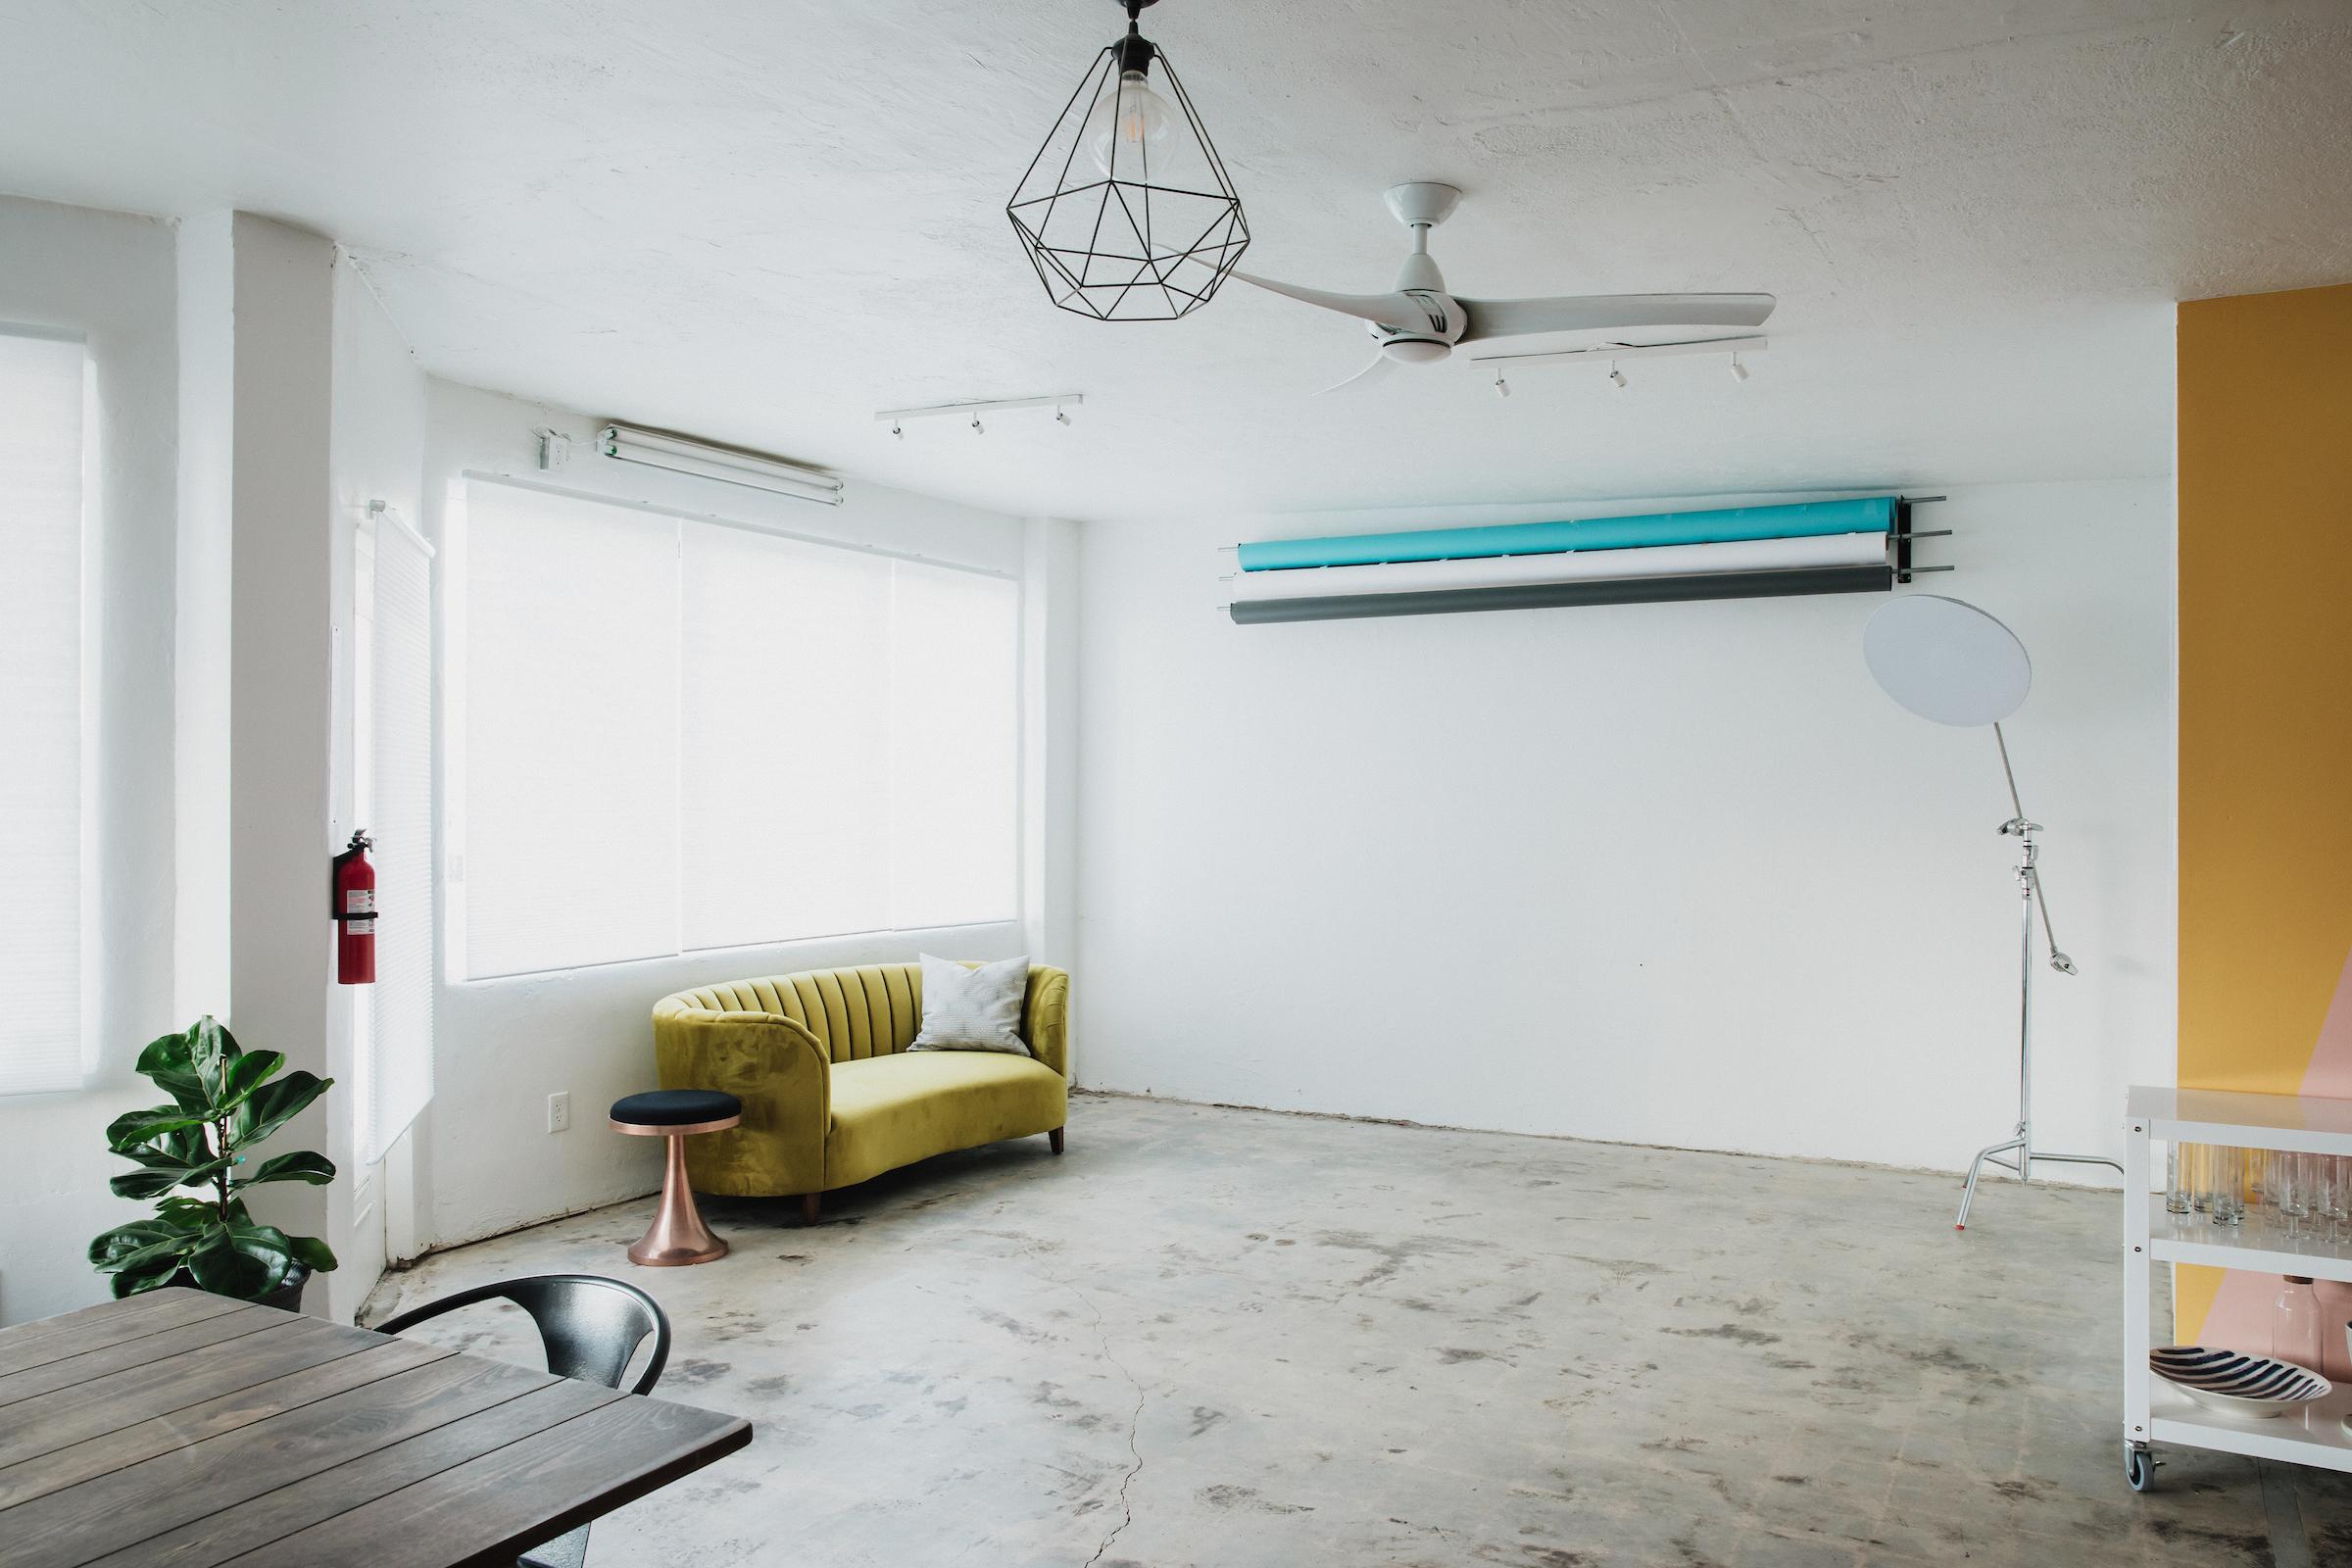 ybh_interiors_SK1_4082.jpg